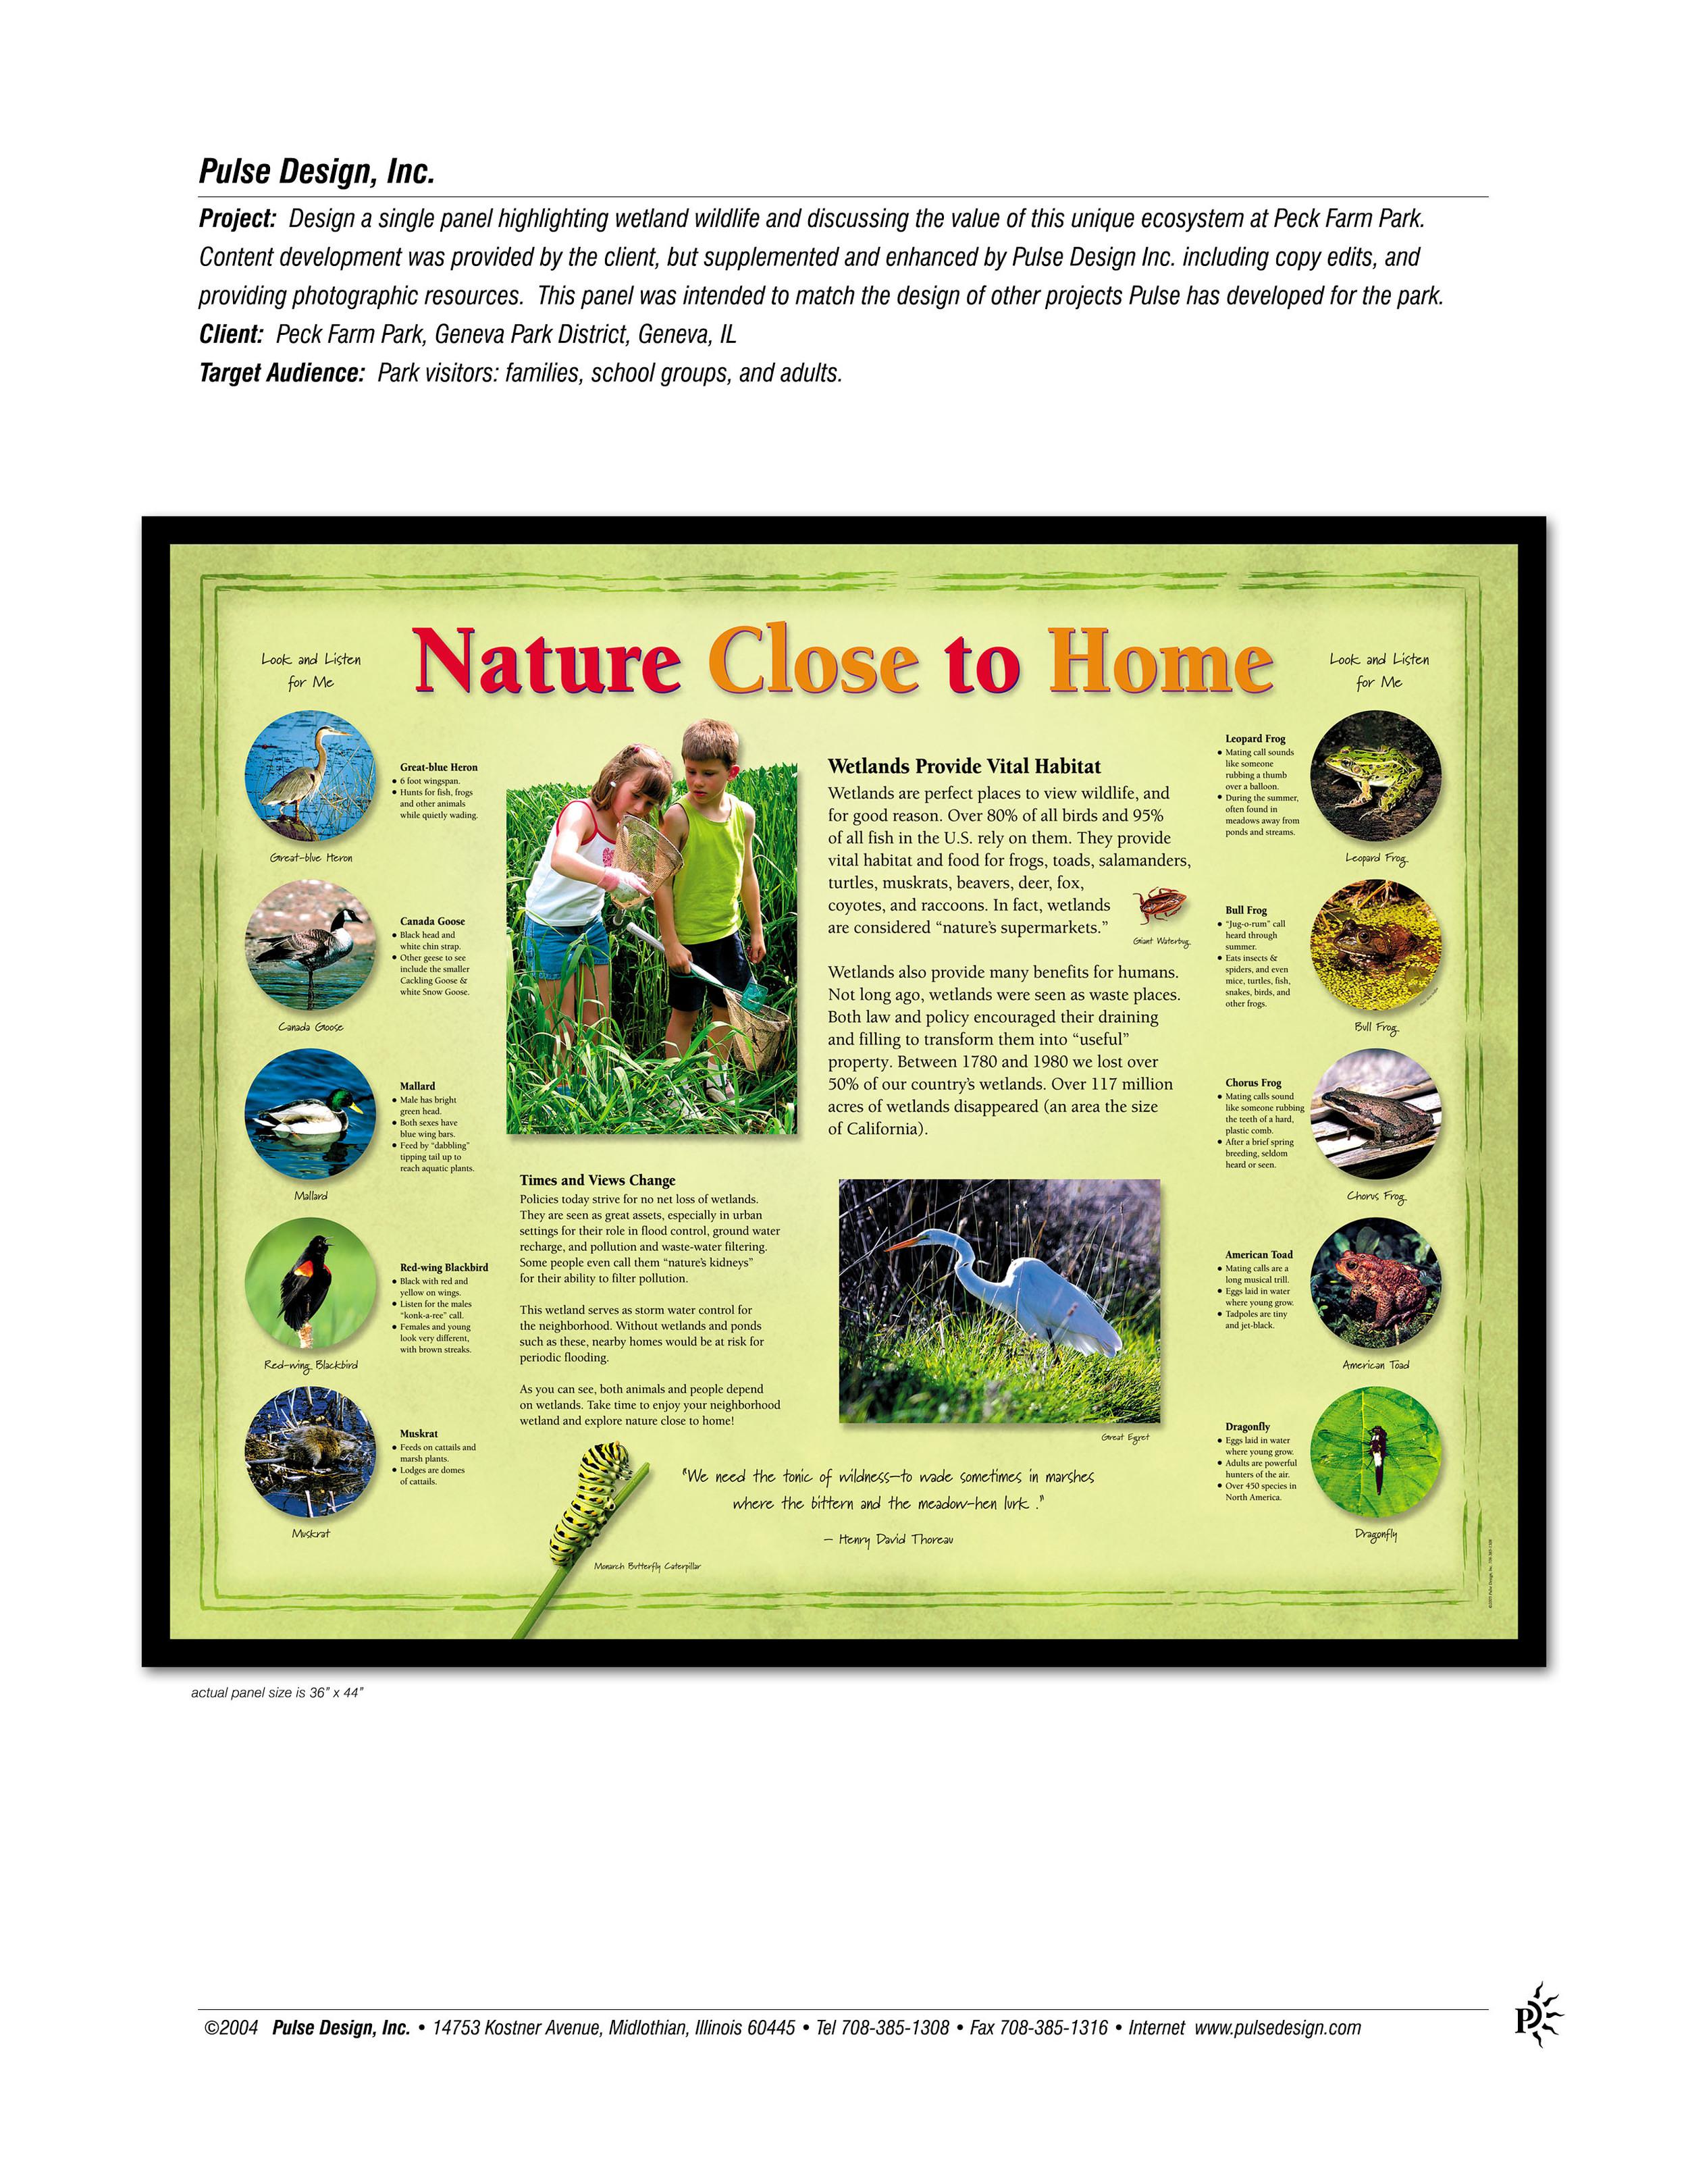 Peck-Farm-Park-Wetland-Sign-Pulse-Design-Inc.jpg